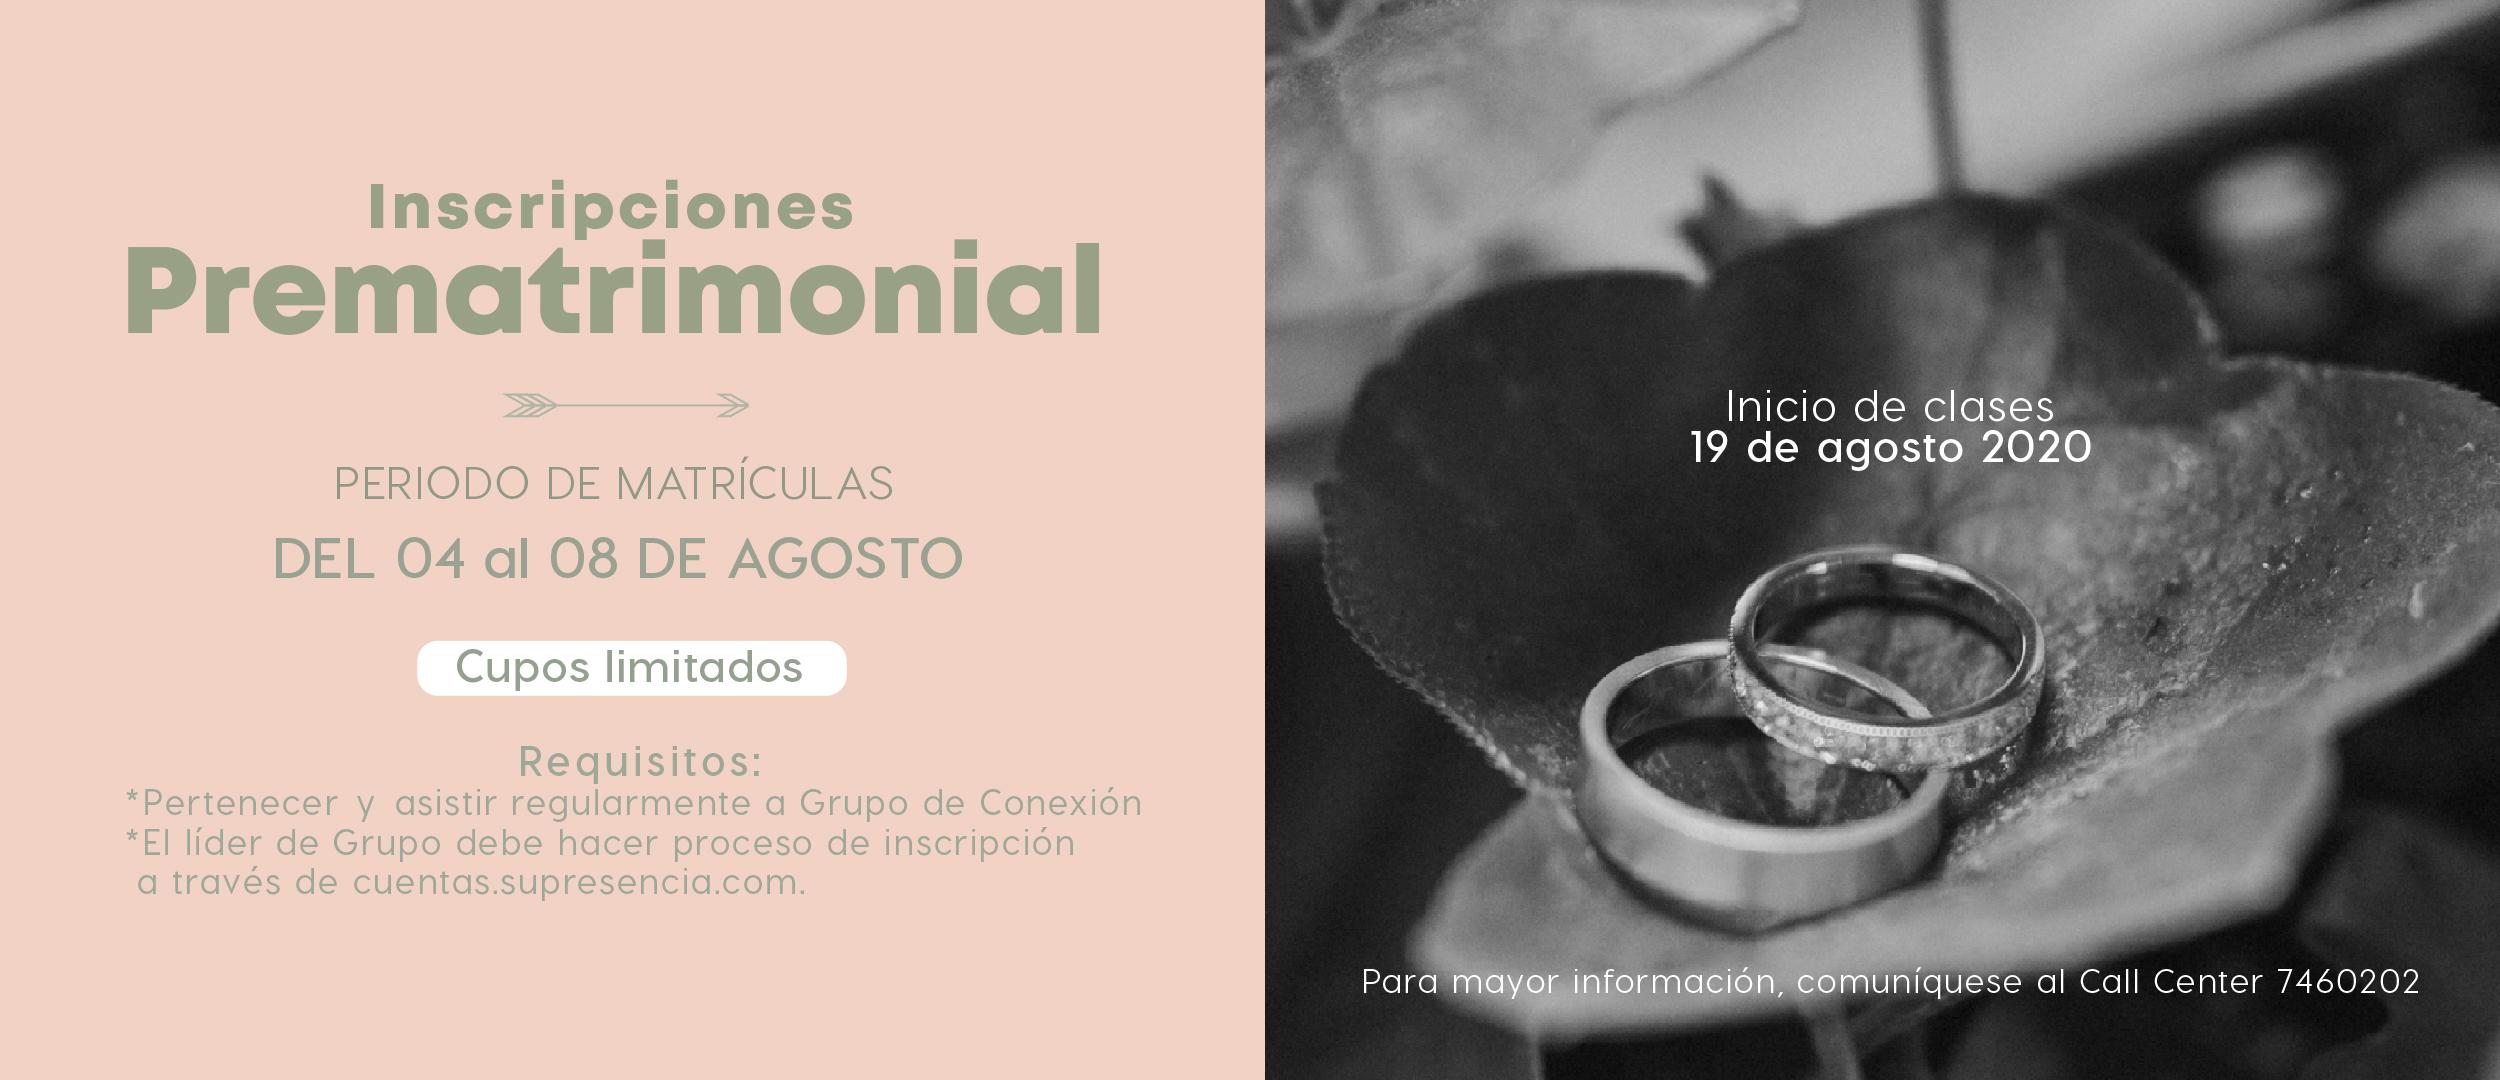 Prematrimonial